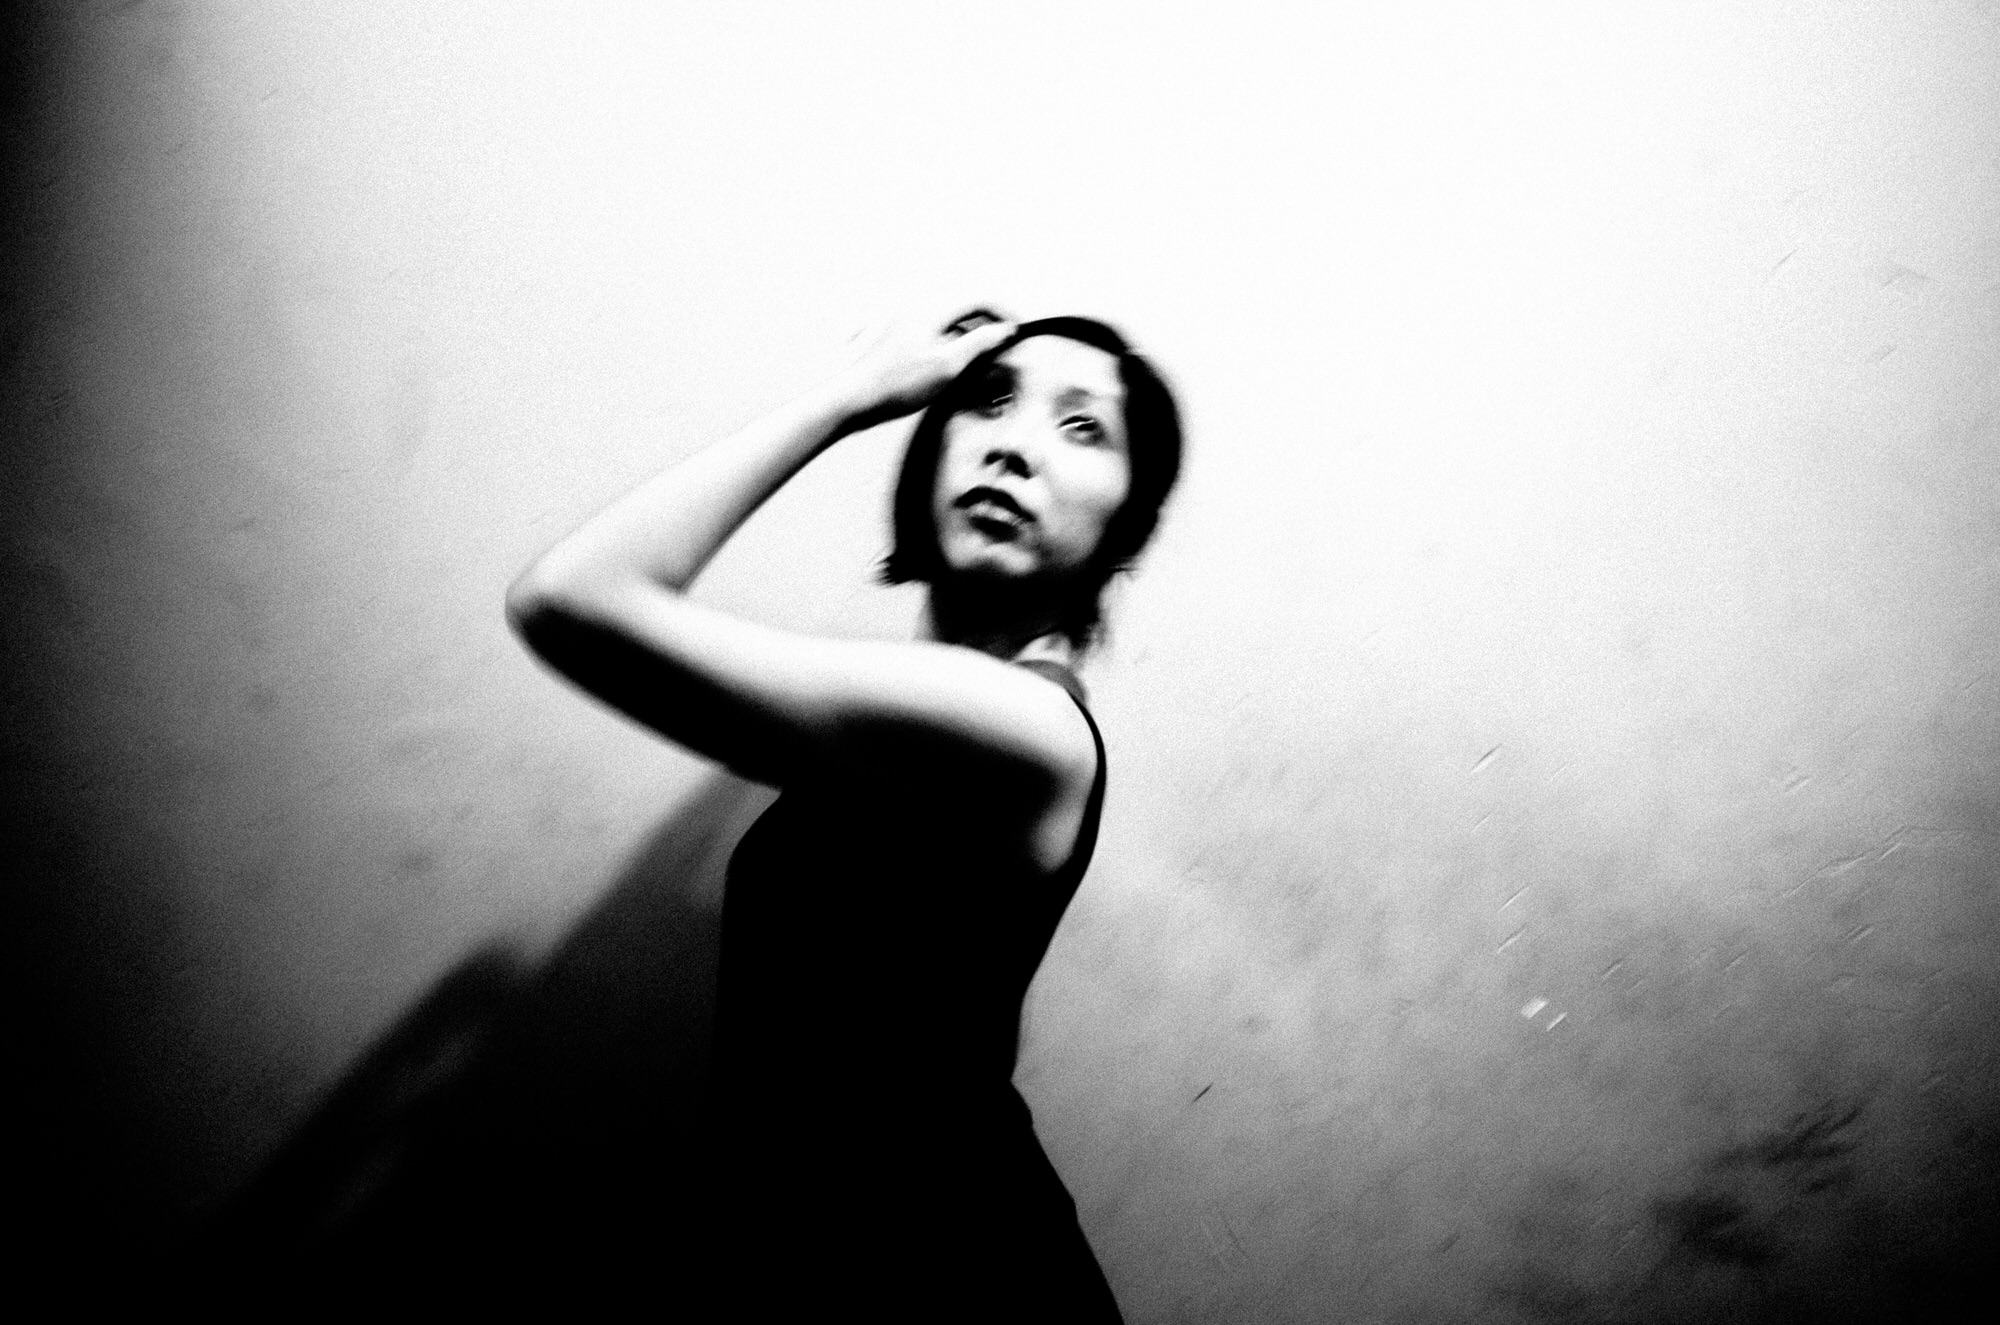 001 ERIC KIM PHOTOGRAPHY00015